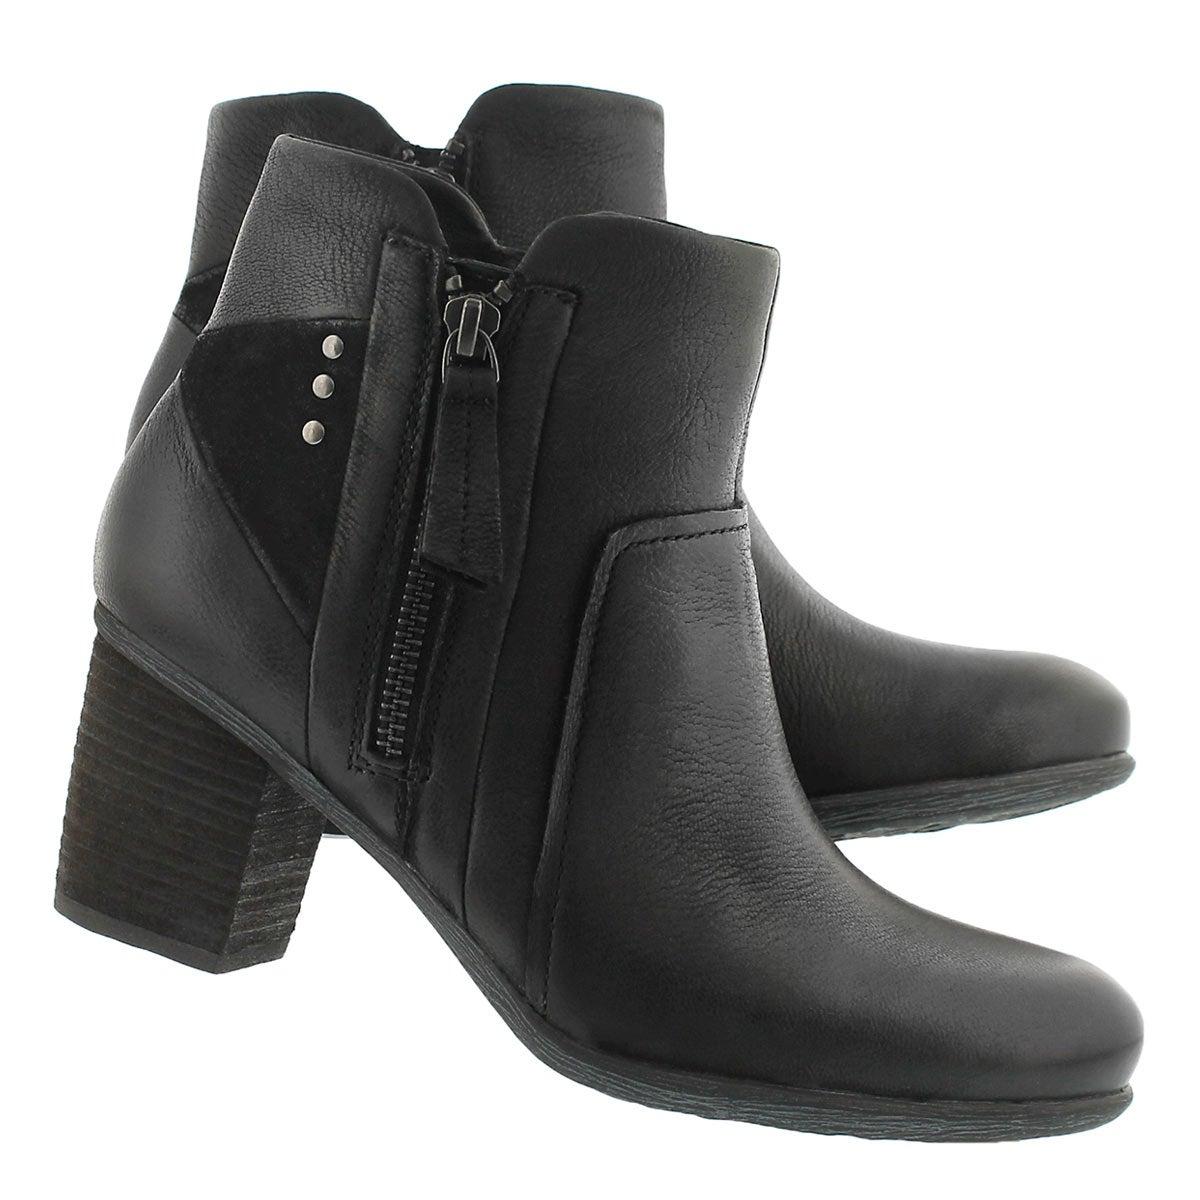 Lds Britney 41 black lthr ankle boot